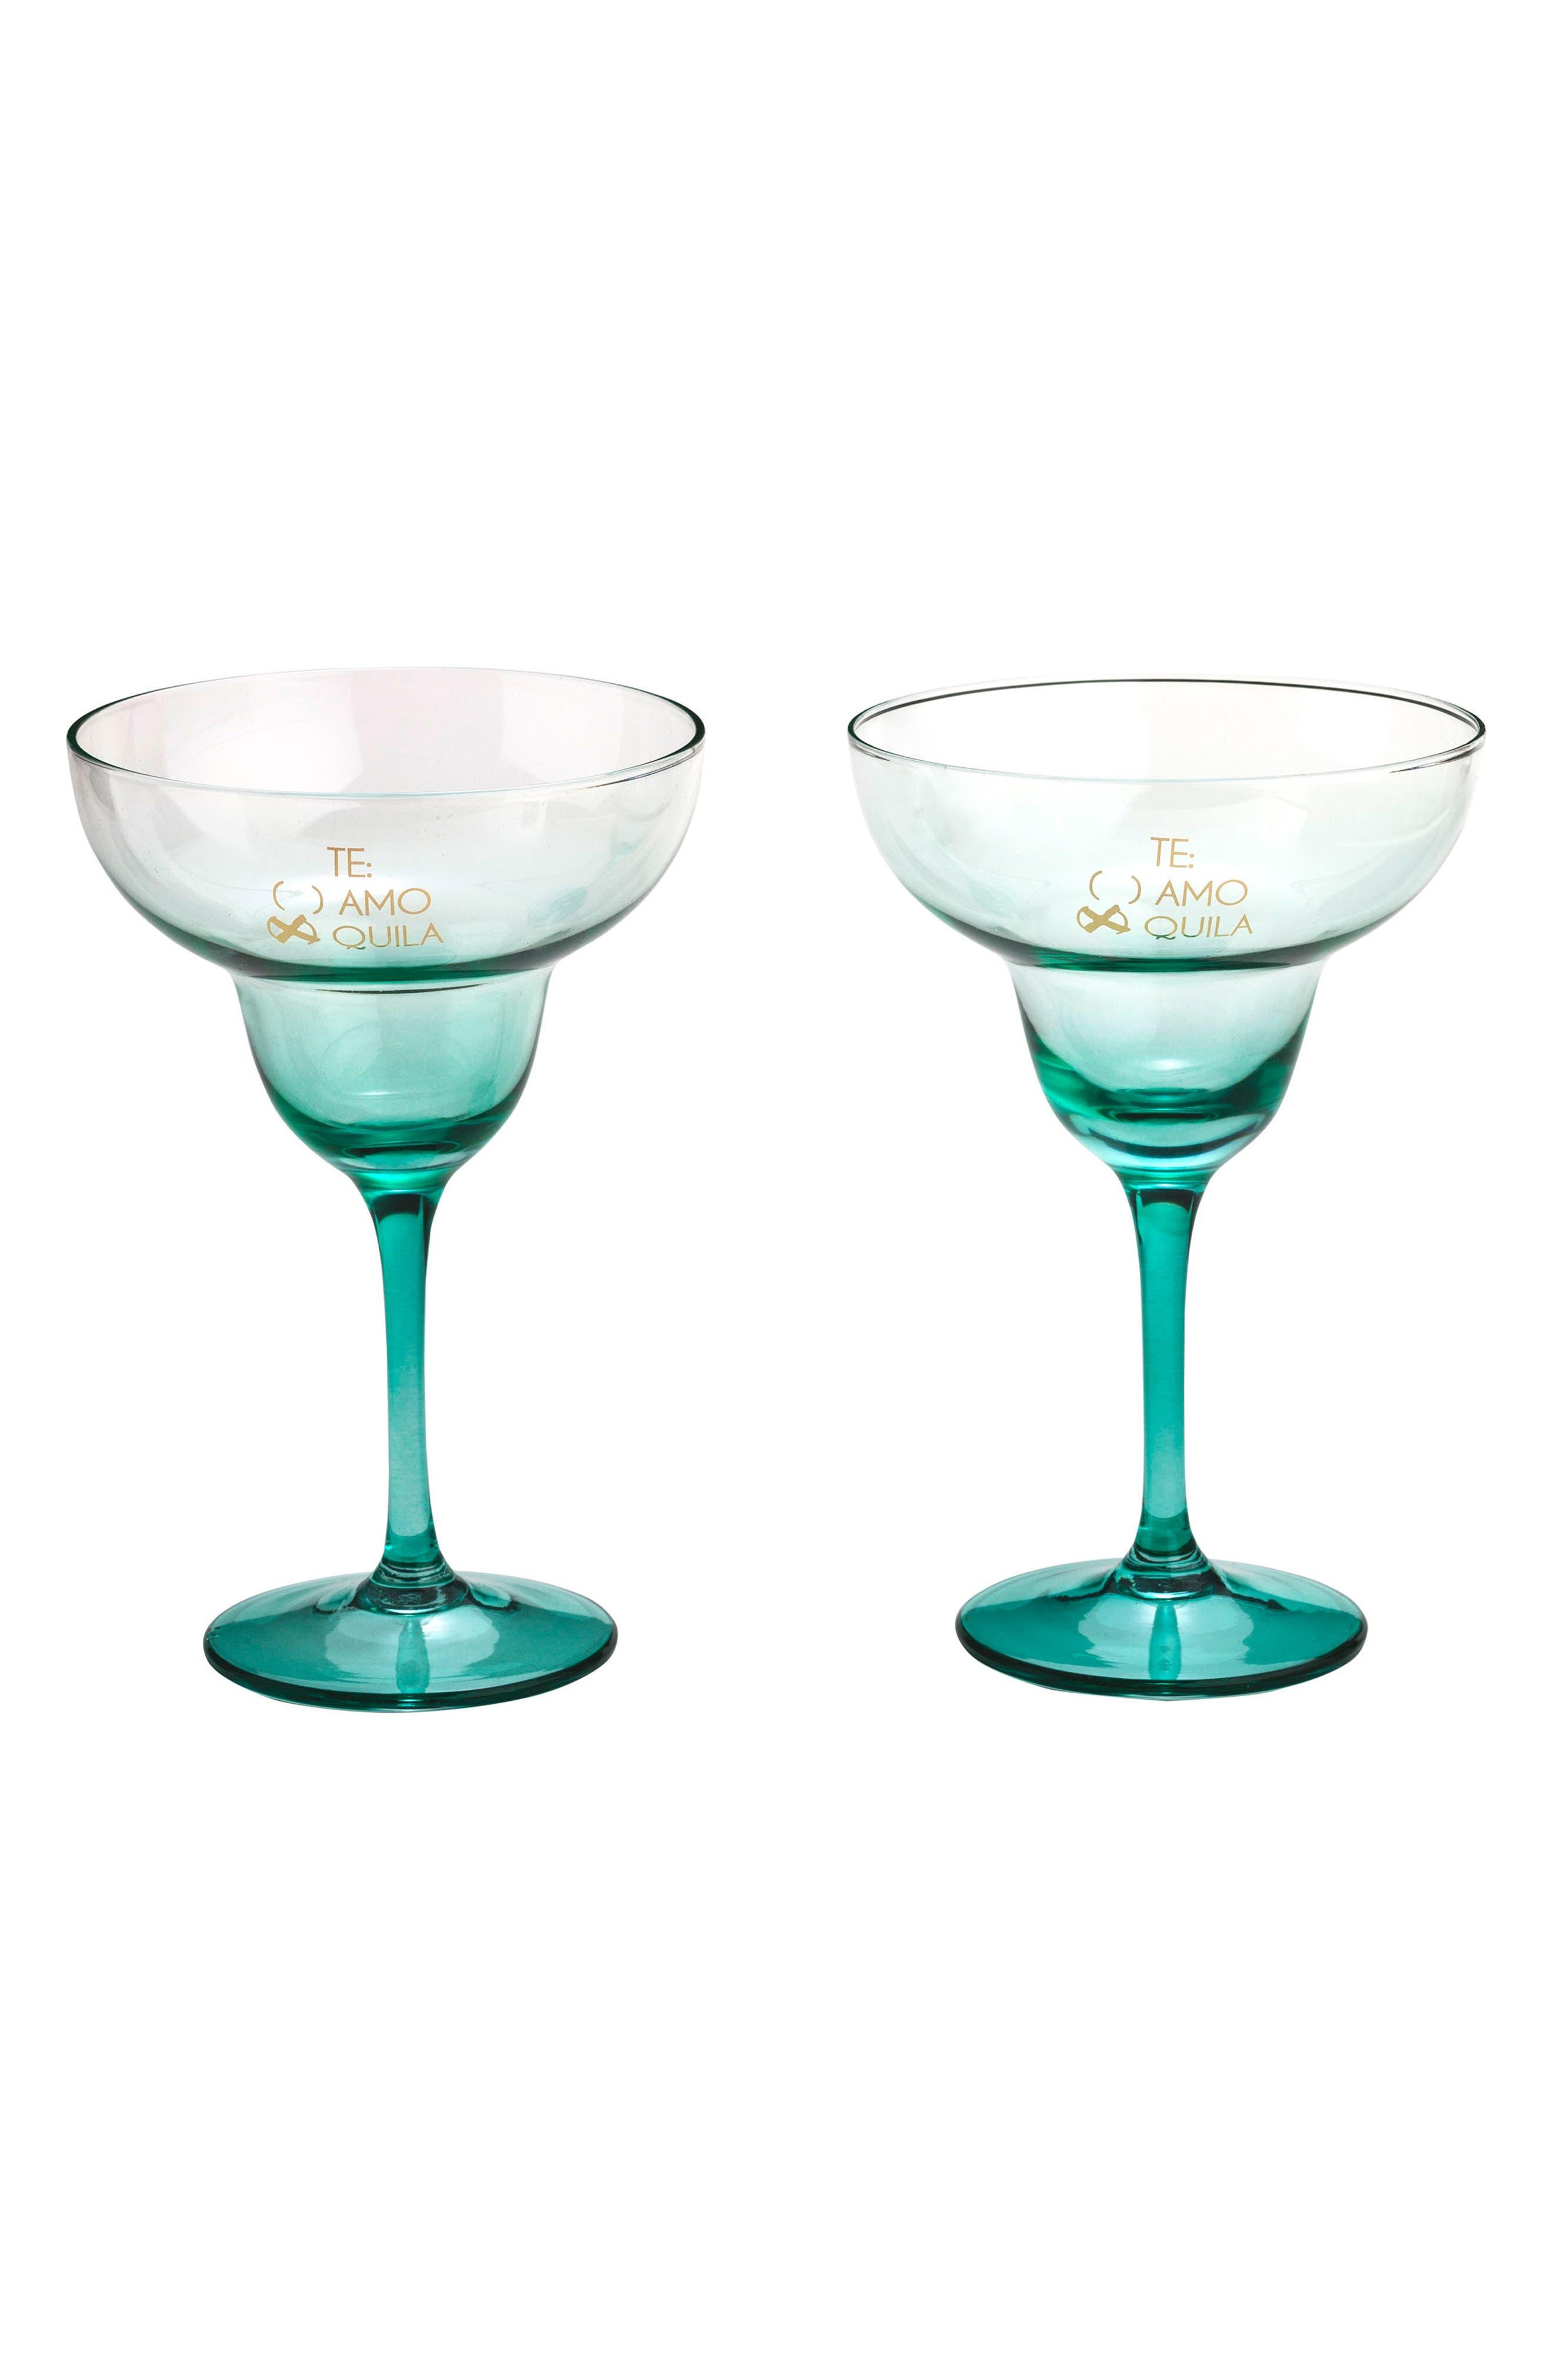 Rosanna Te Amo x Quila Set of 2 Margarita Glasses